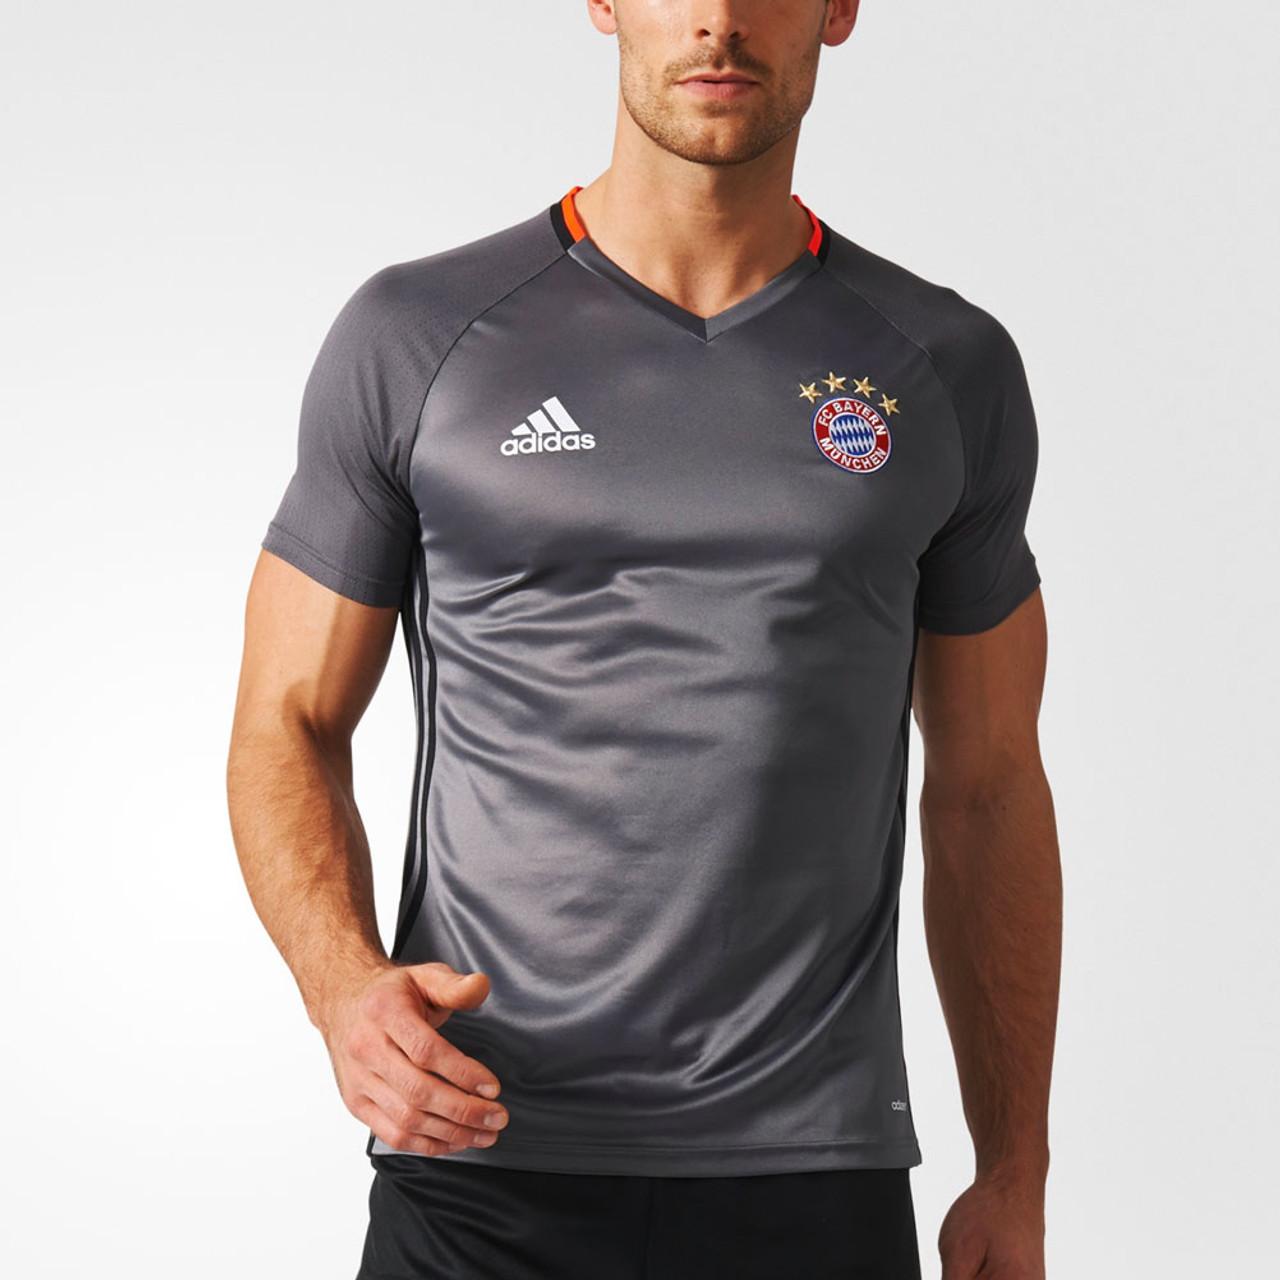 huge discount 5e90c 4dbc8 ADIDAS bayern munich football (FCB) training jersey [grey]